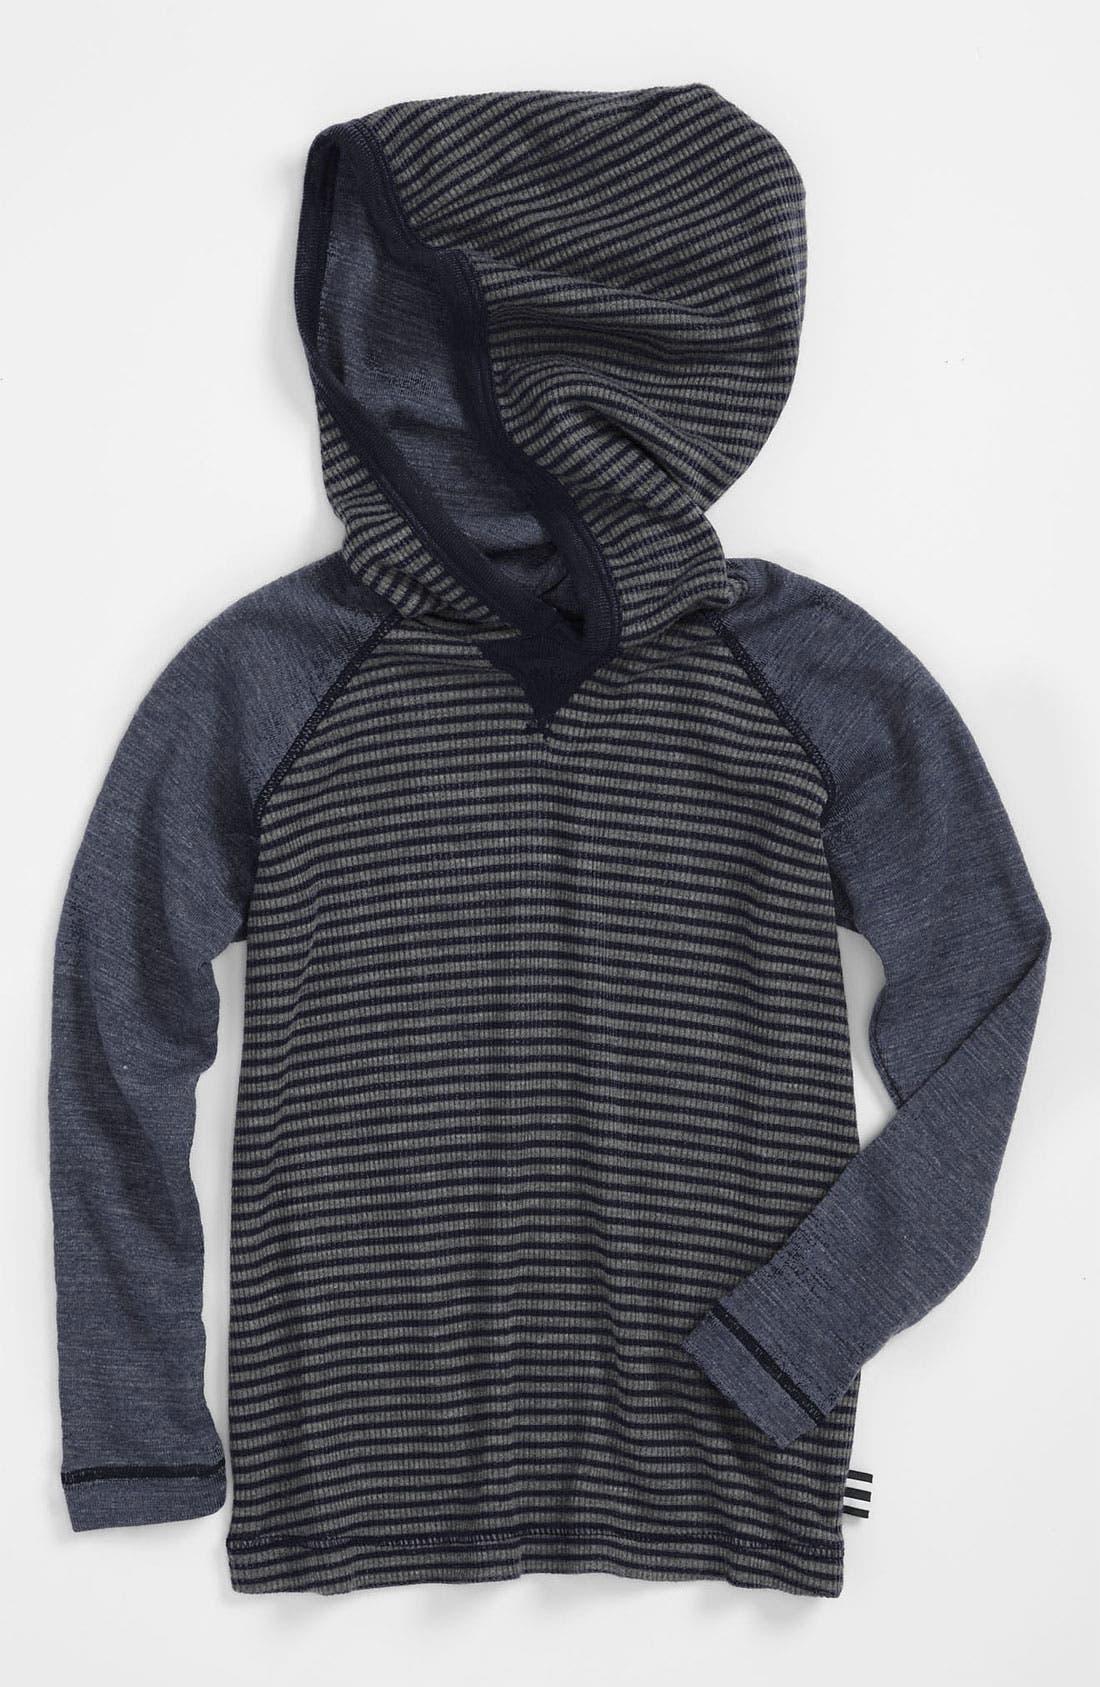 Main Image - Splendid 'Mini Stripe' Thermal Hooded Top (Toddler)